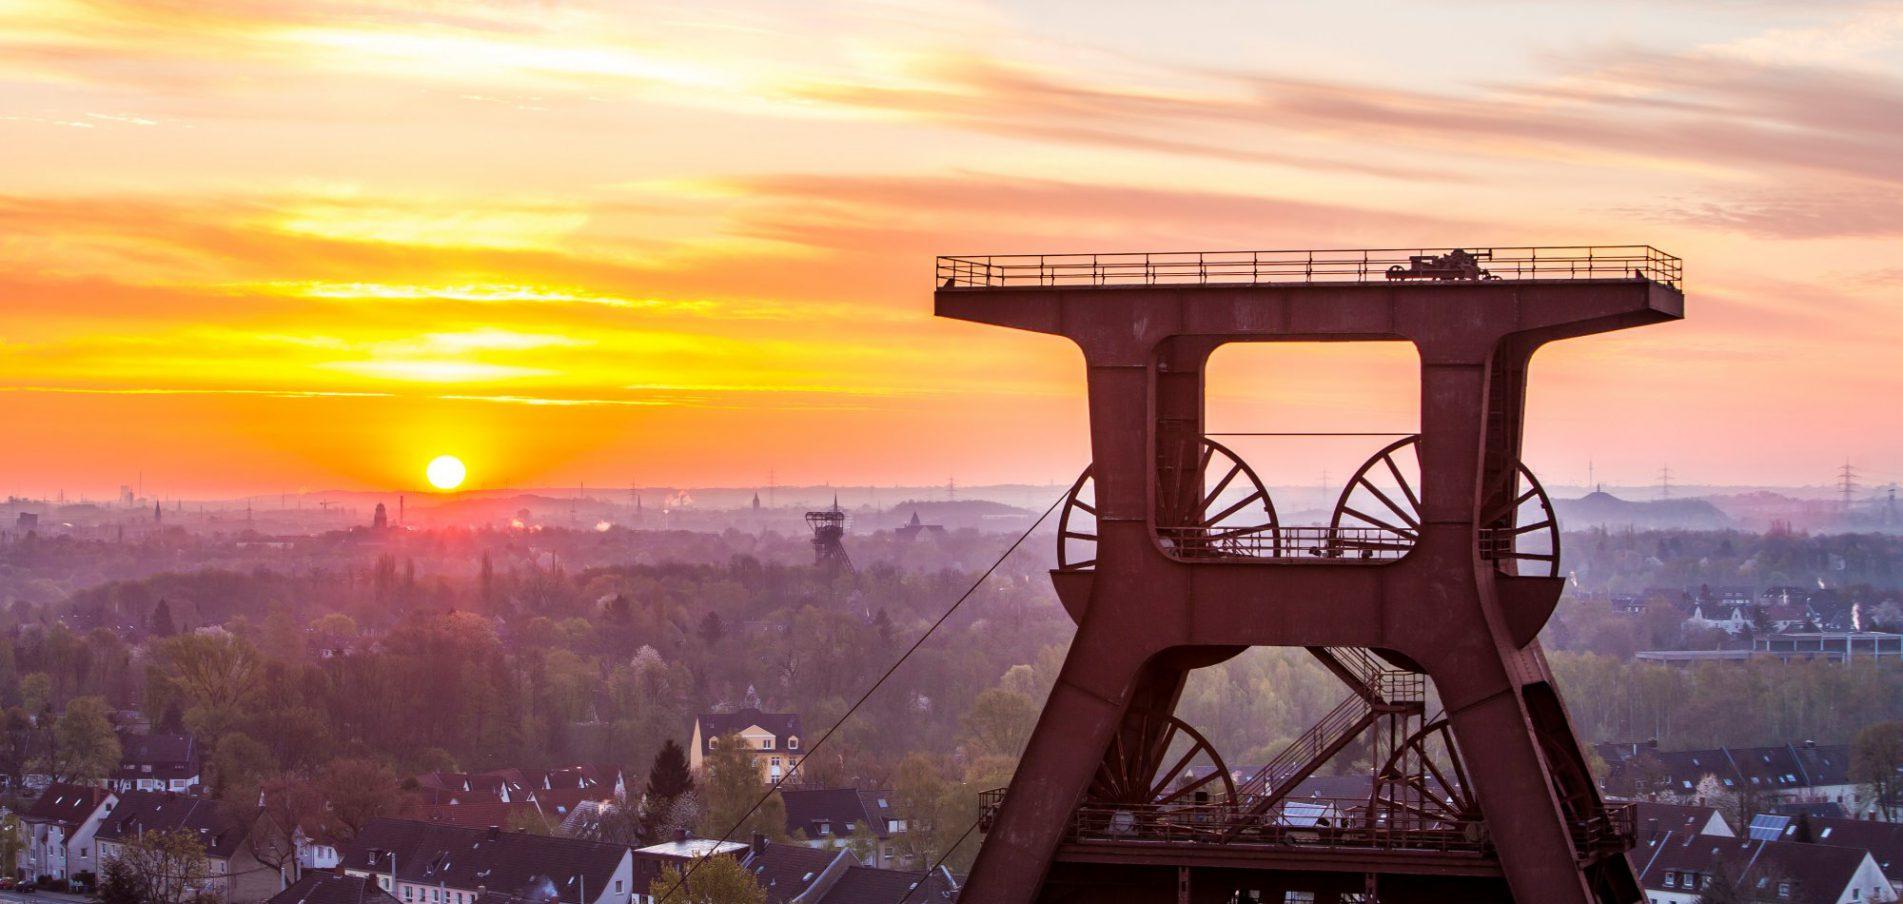 Willkommen in Essen ...grüne Hauptstadt Europas 2017!